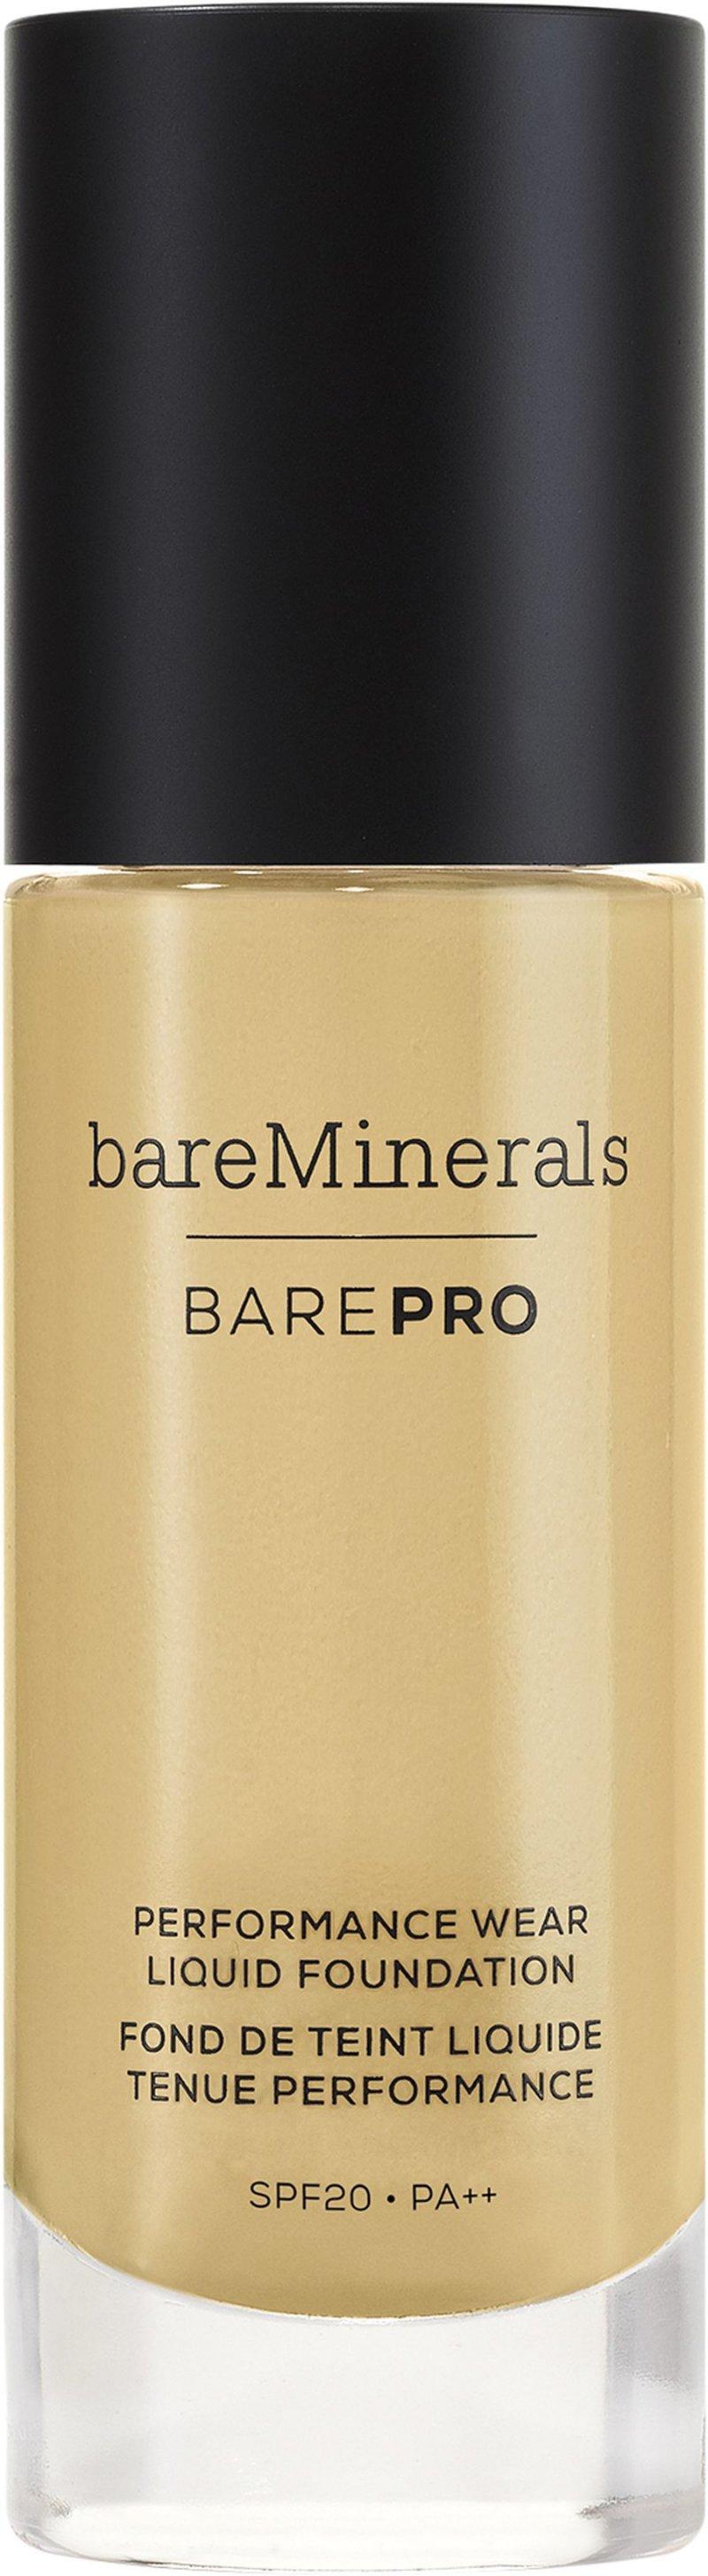 Image of   Bareminerals Foundation - Barepro Performance Wear Liquid - Sandstone 16